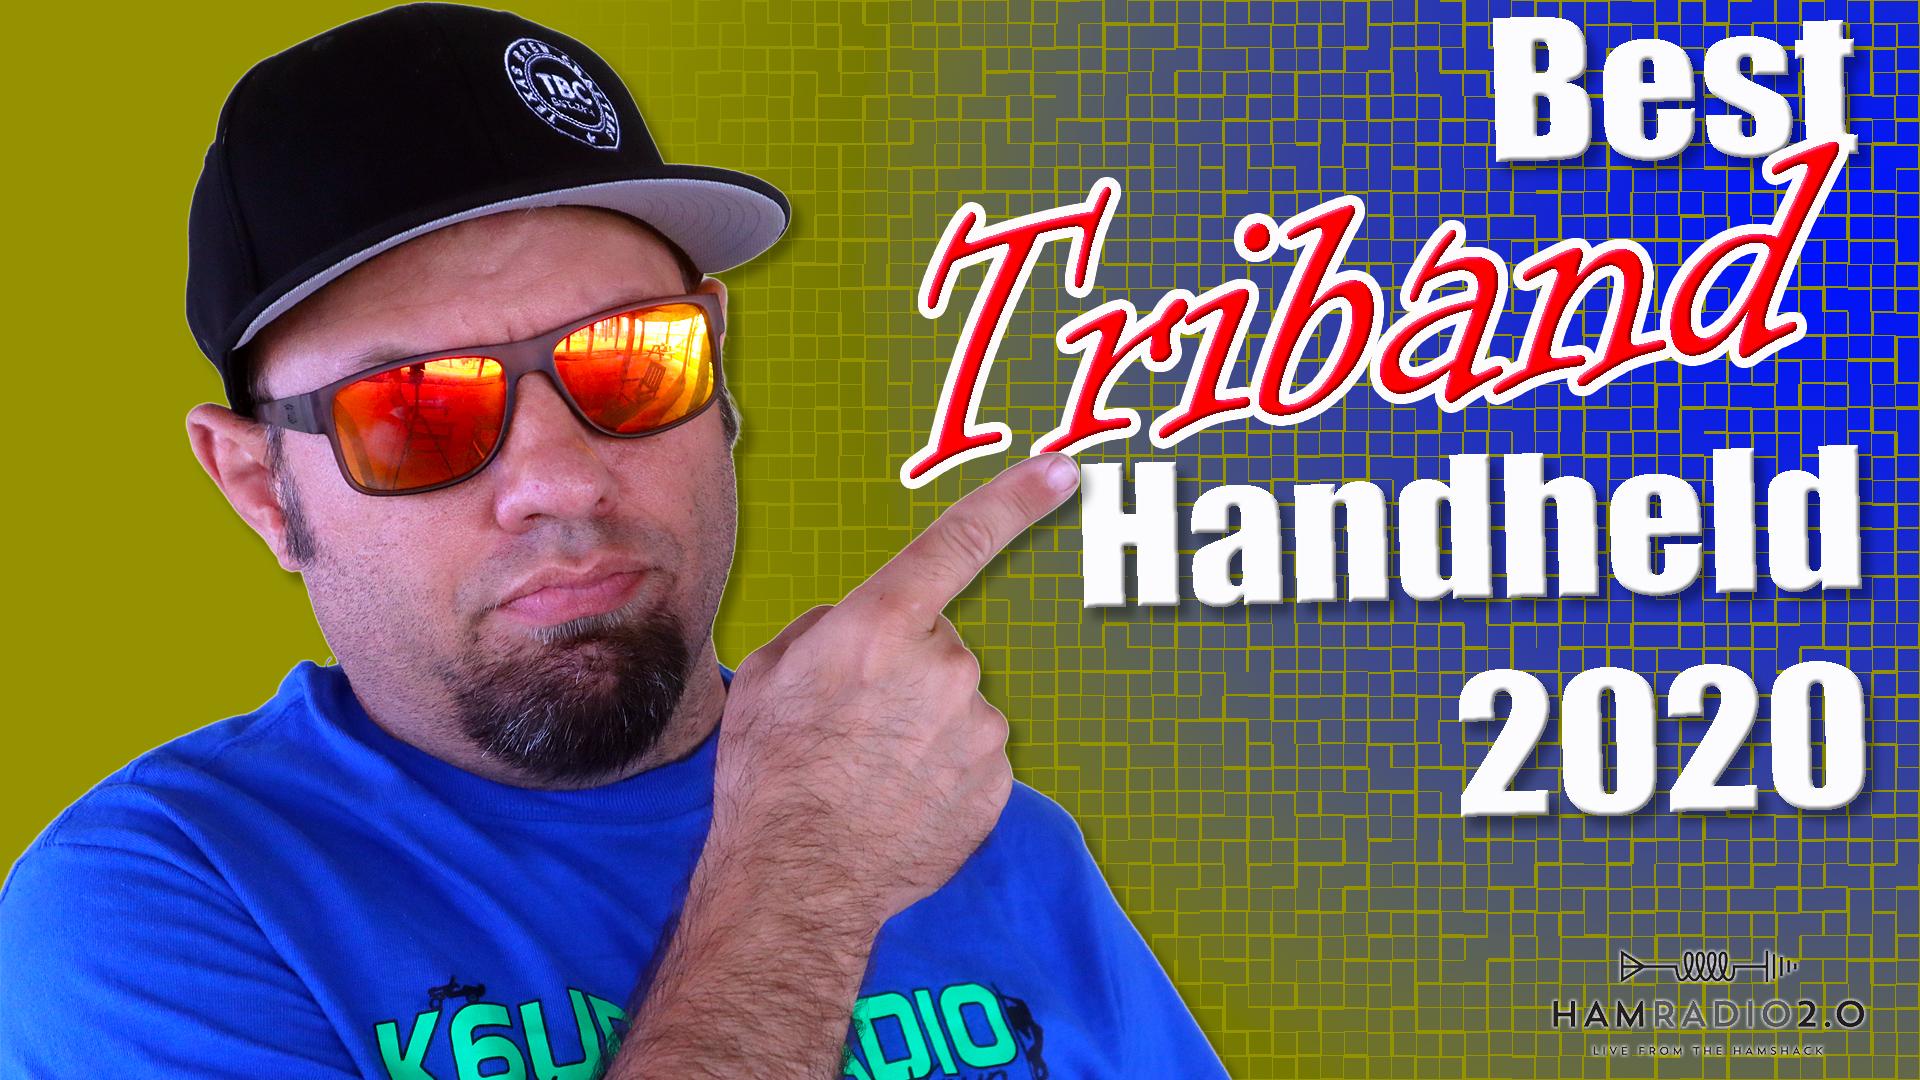 Episode 462: Best Handheld Ham Radio TRI BAND for 2020 – Tri Band Radio Comparison